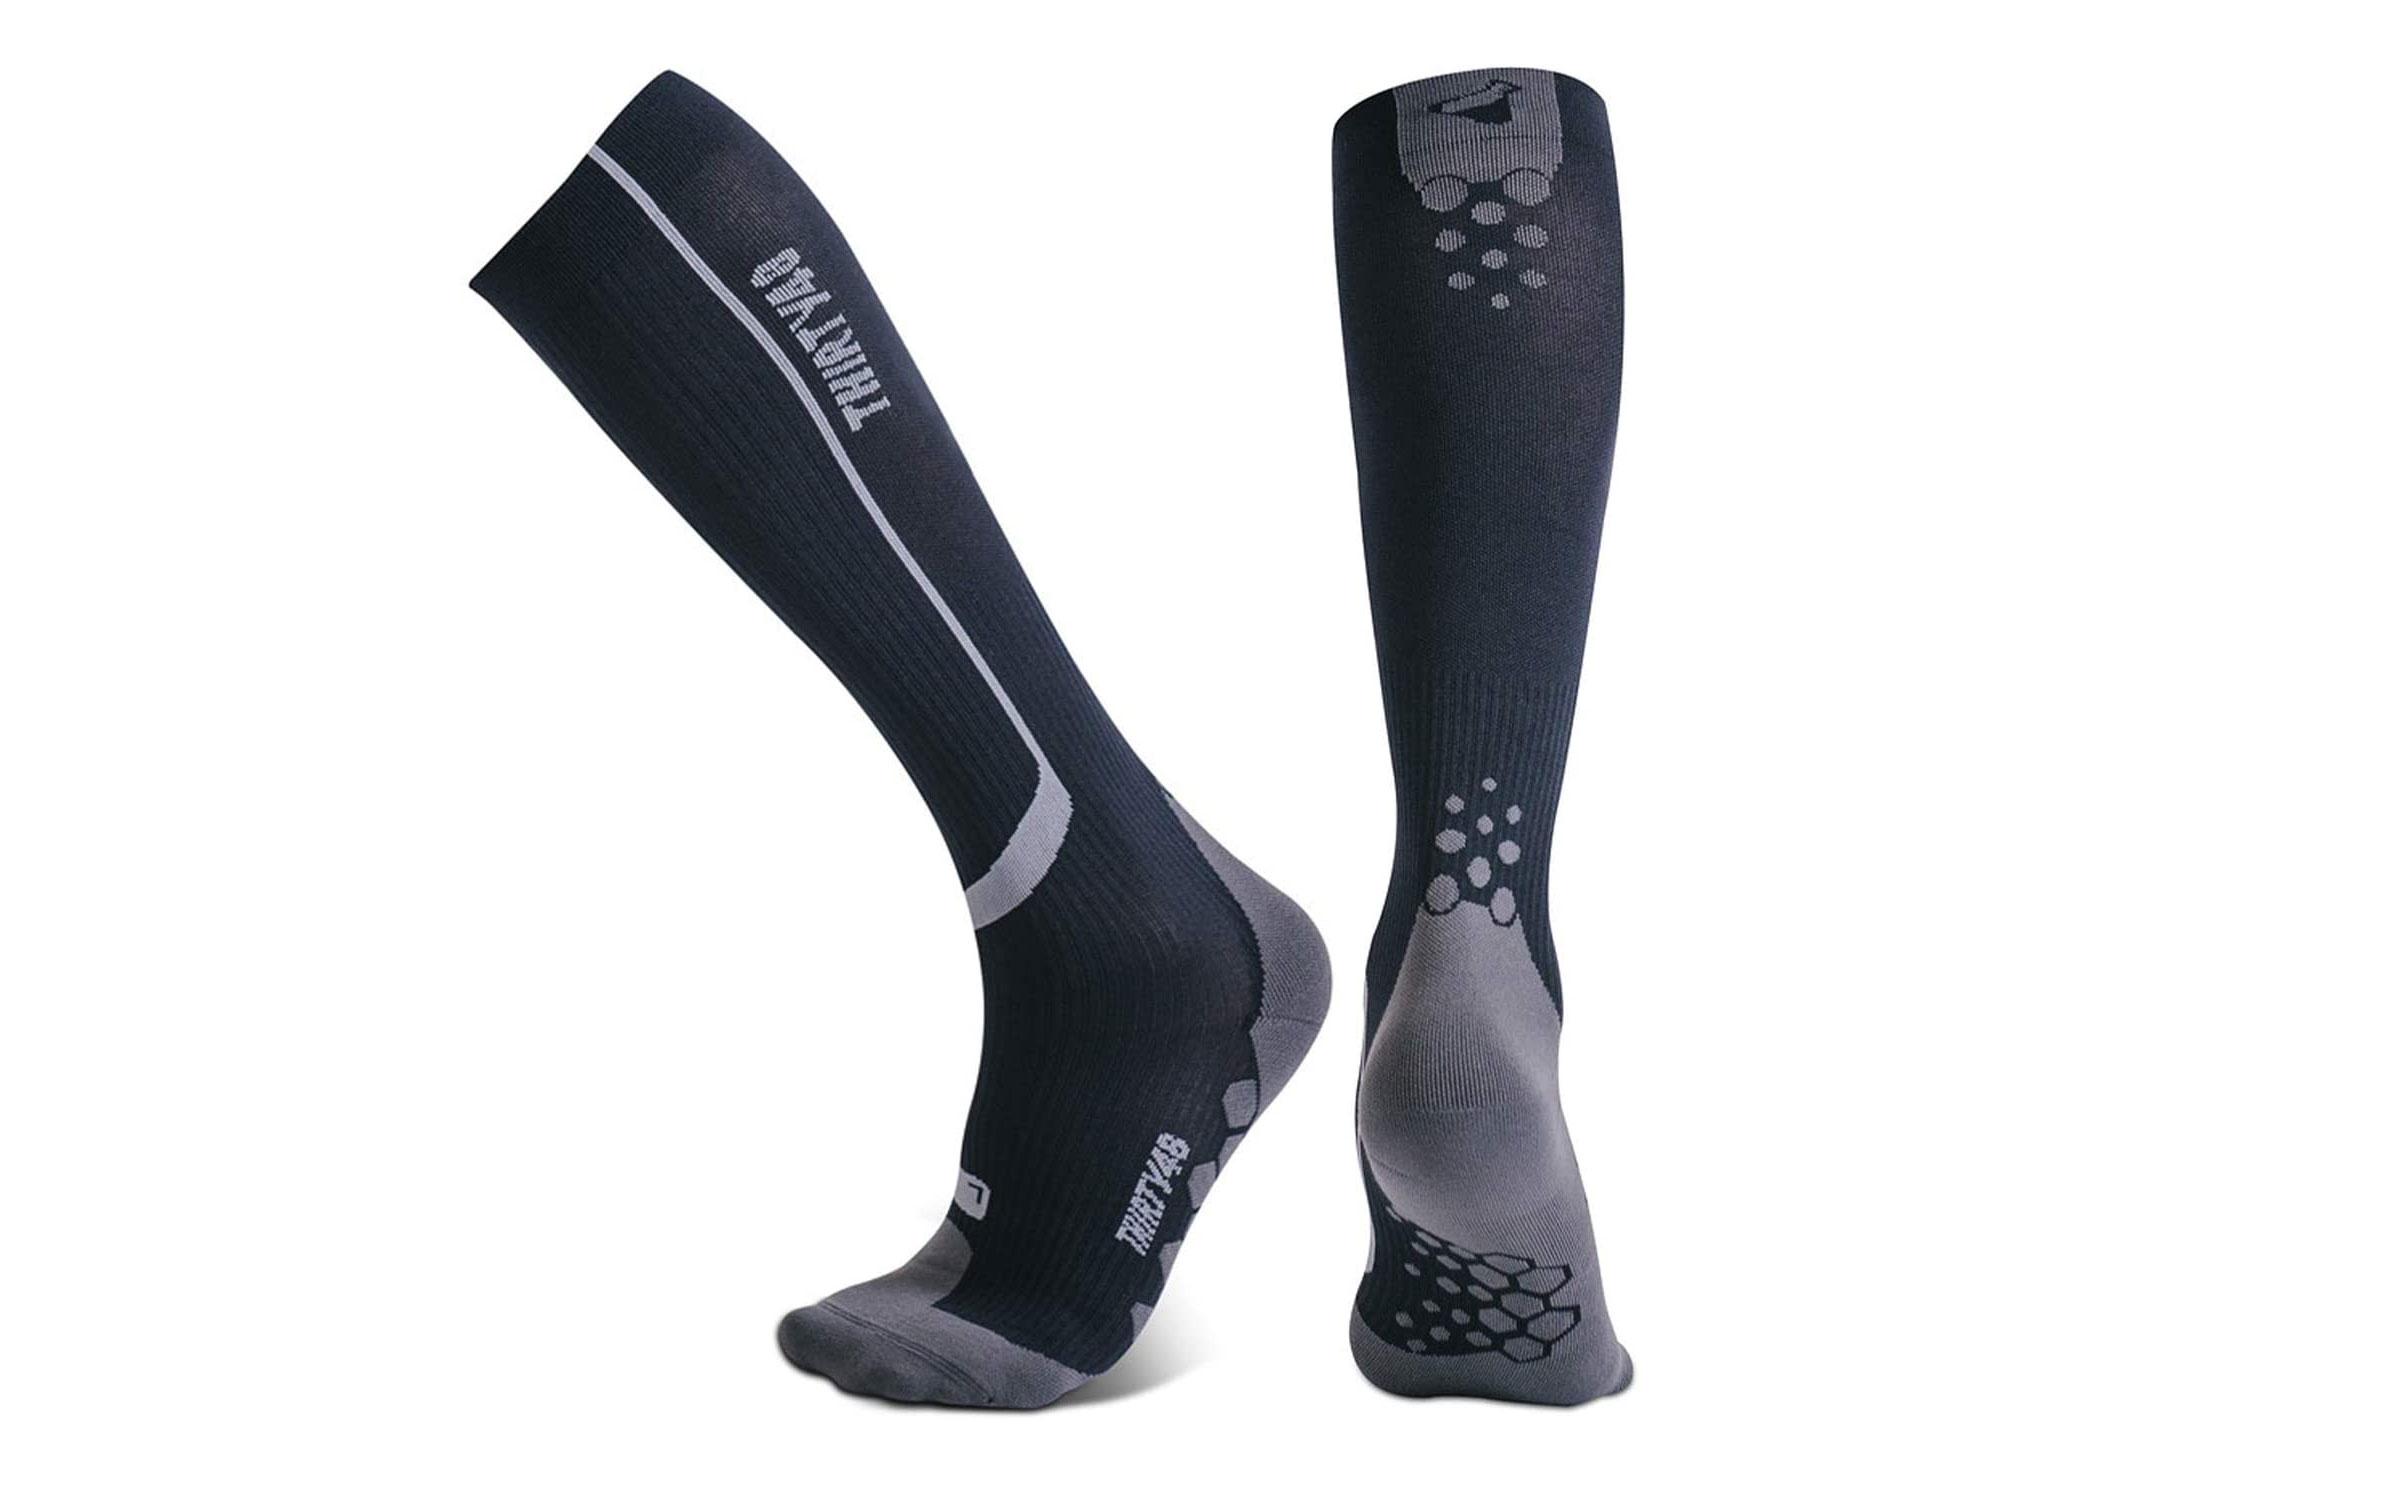 thirty48 elite compression socks